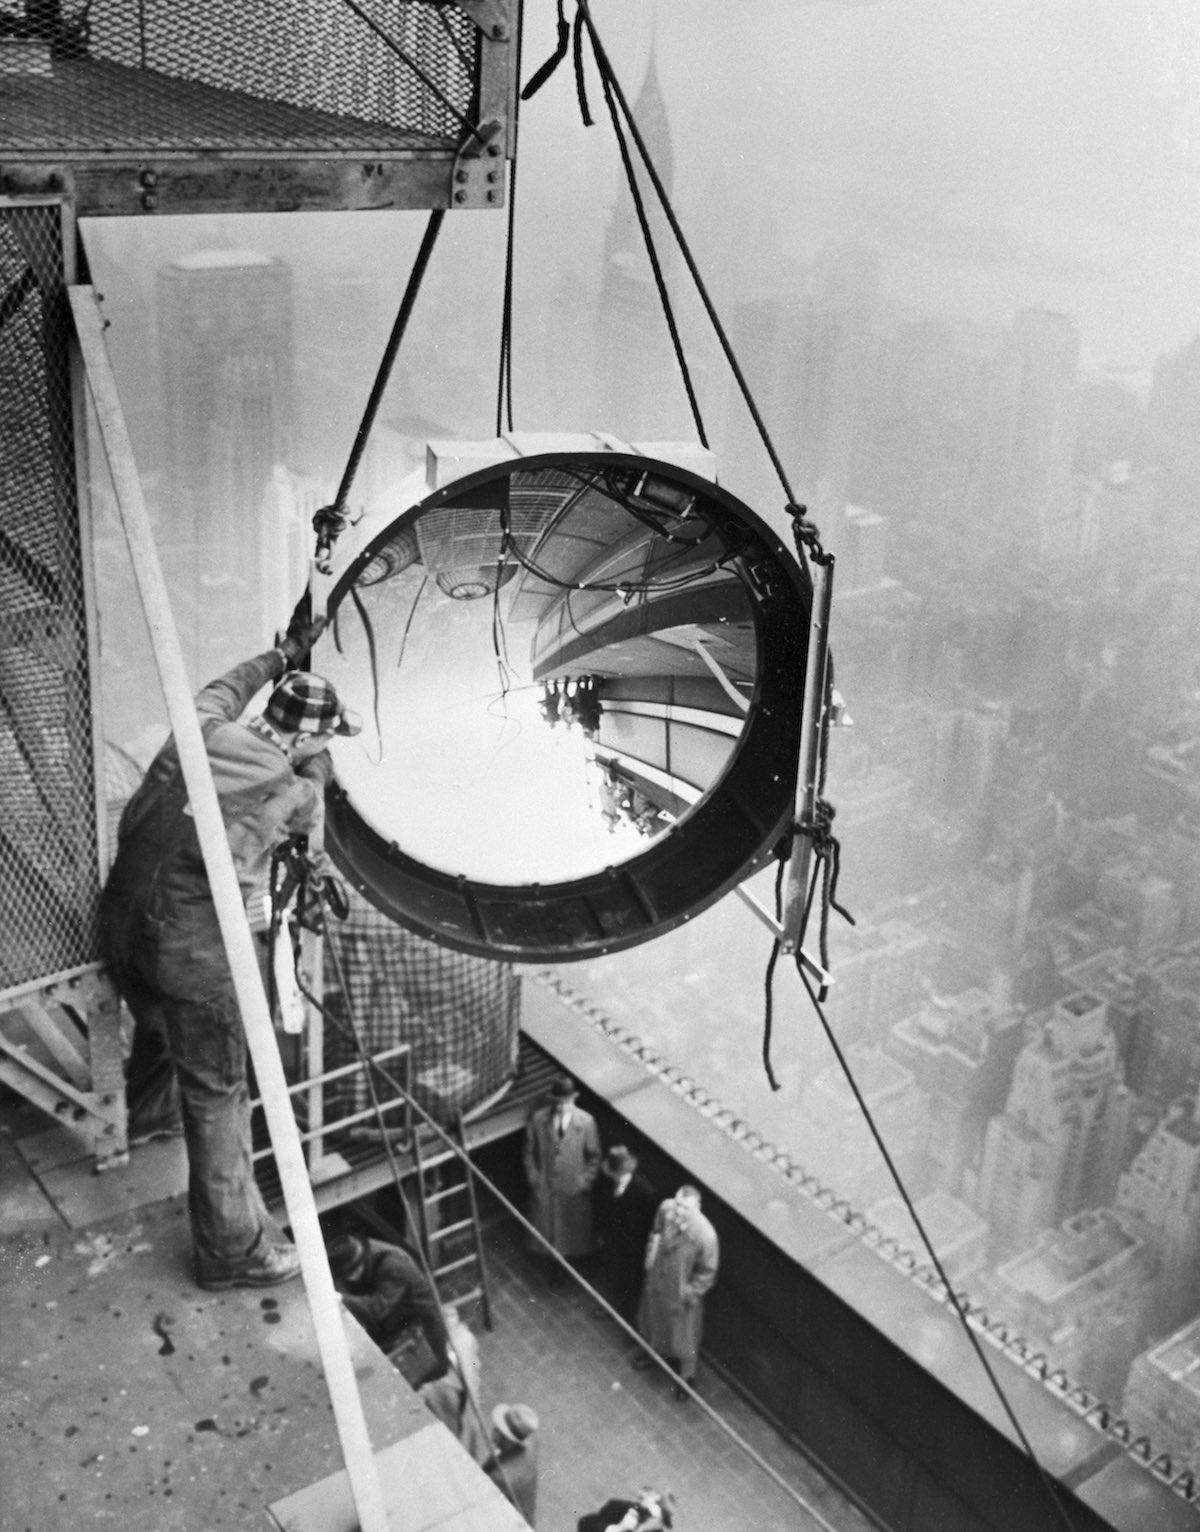 Workmen Install Light On Empire State